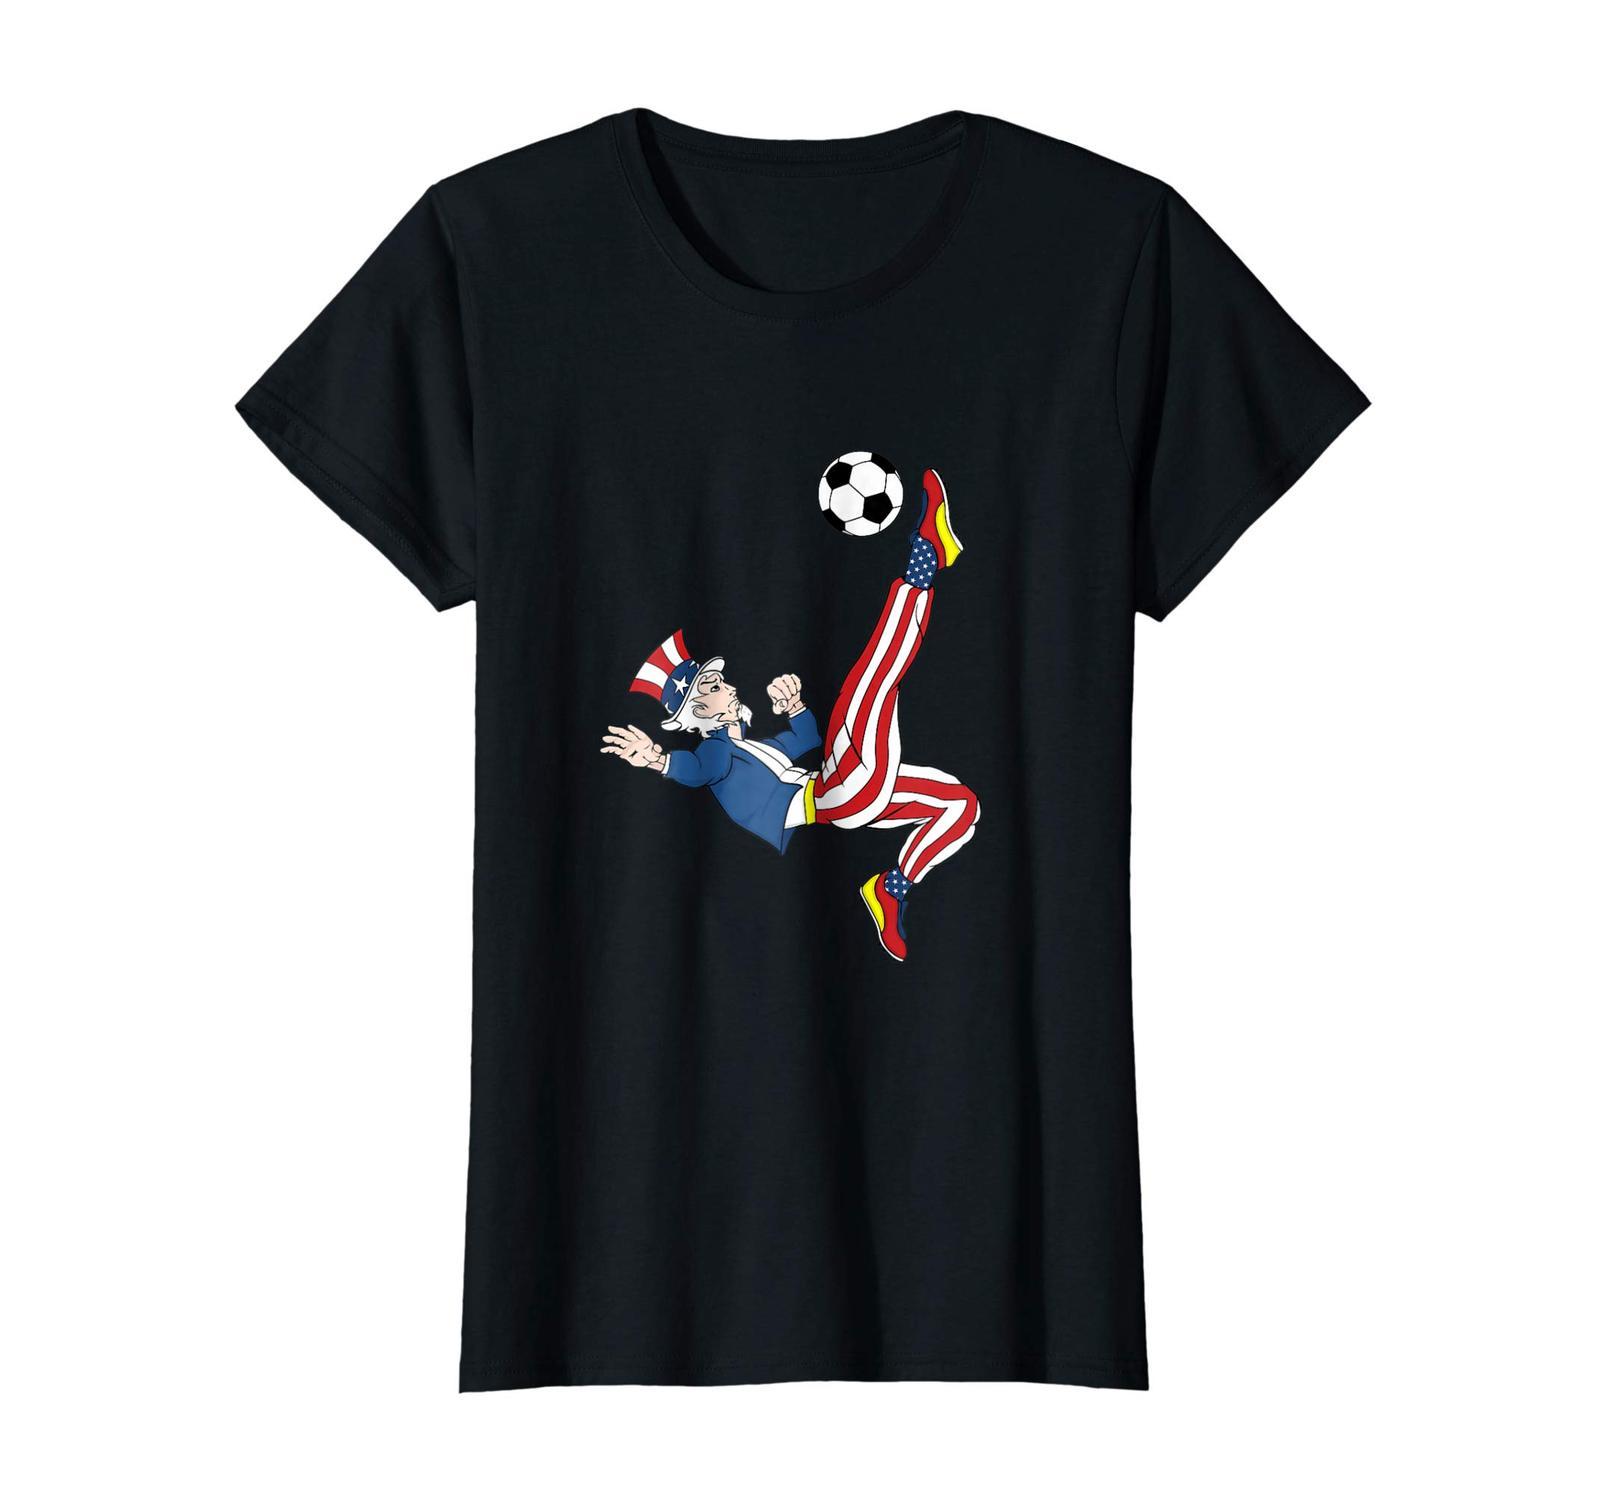 New Shirts - Uncle Sam Soccer American Flag T-Shirt Patriotic Merica Wowen